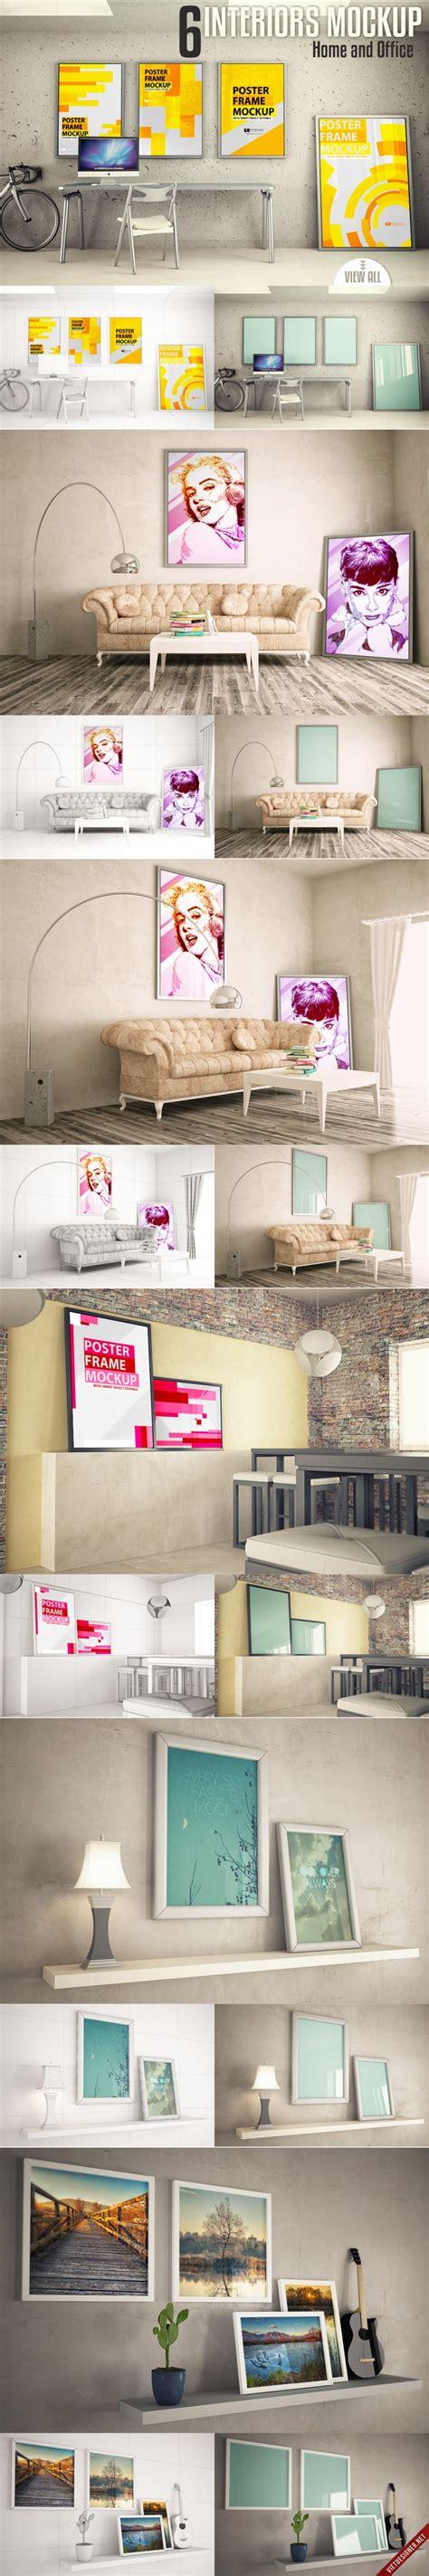 Interiors mock up Vol. 2 373459   Really Cool   Di?n ?àn Designer Vi?t Nam